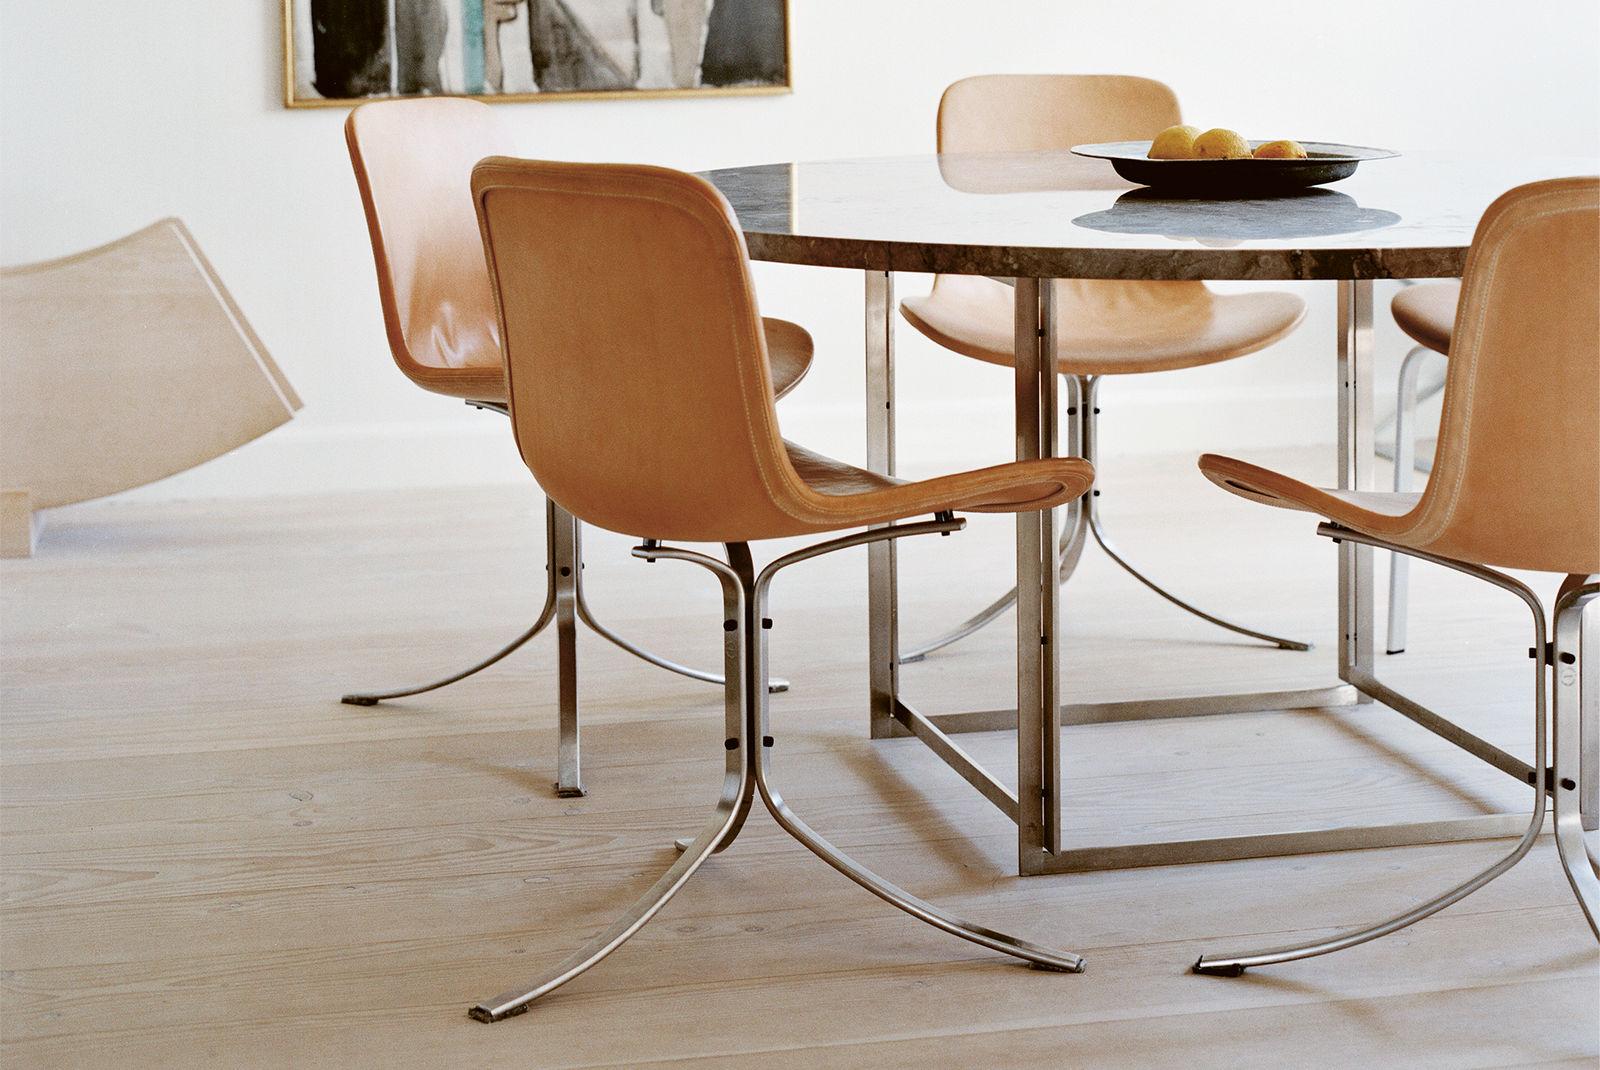 PK11 Chair designed by Poul Kjærholm